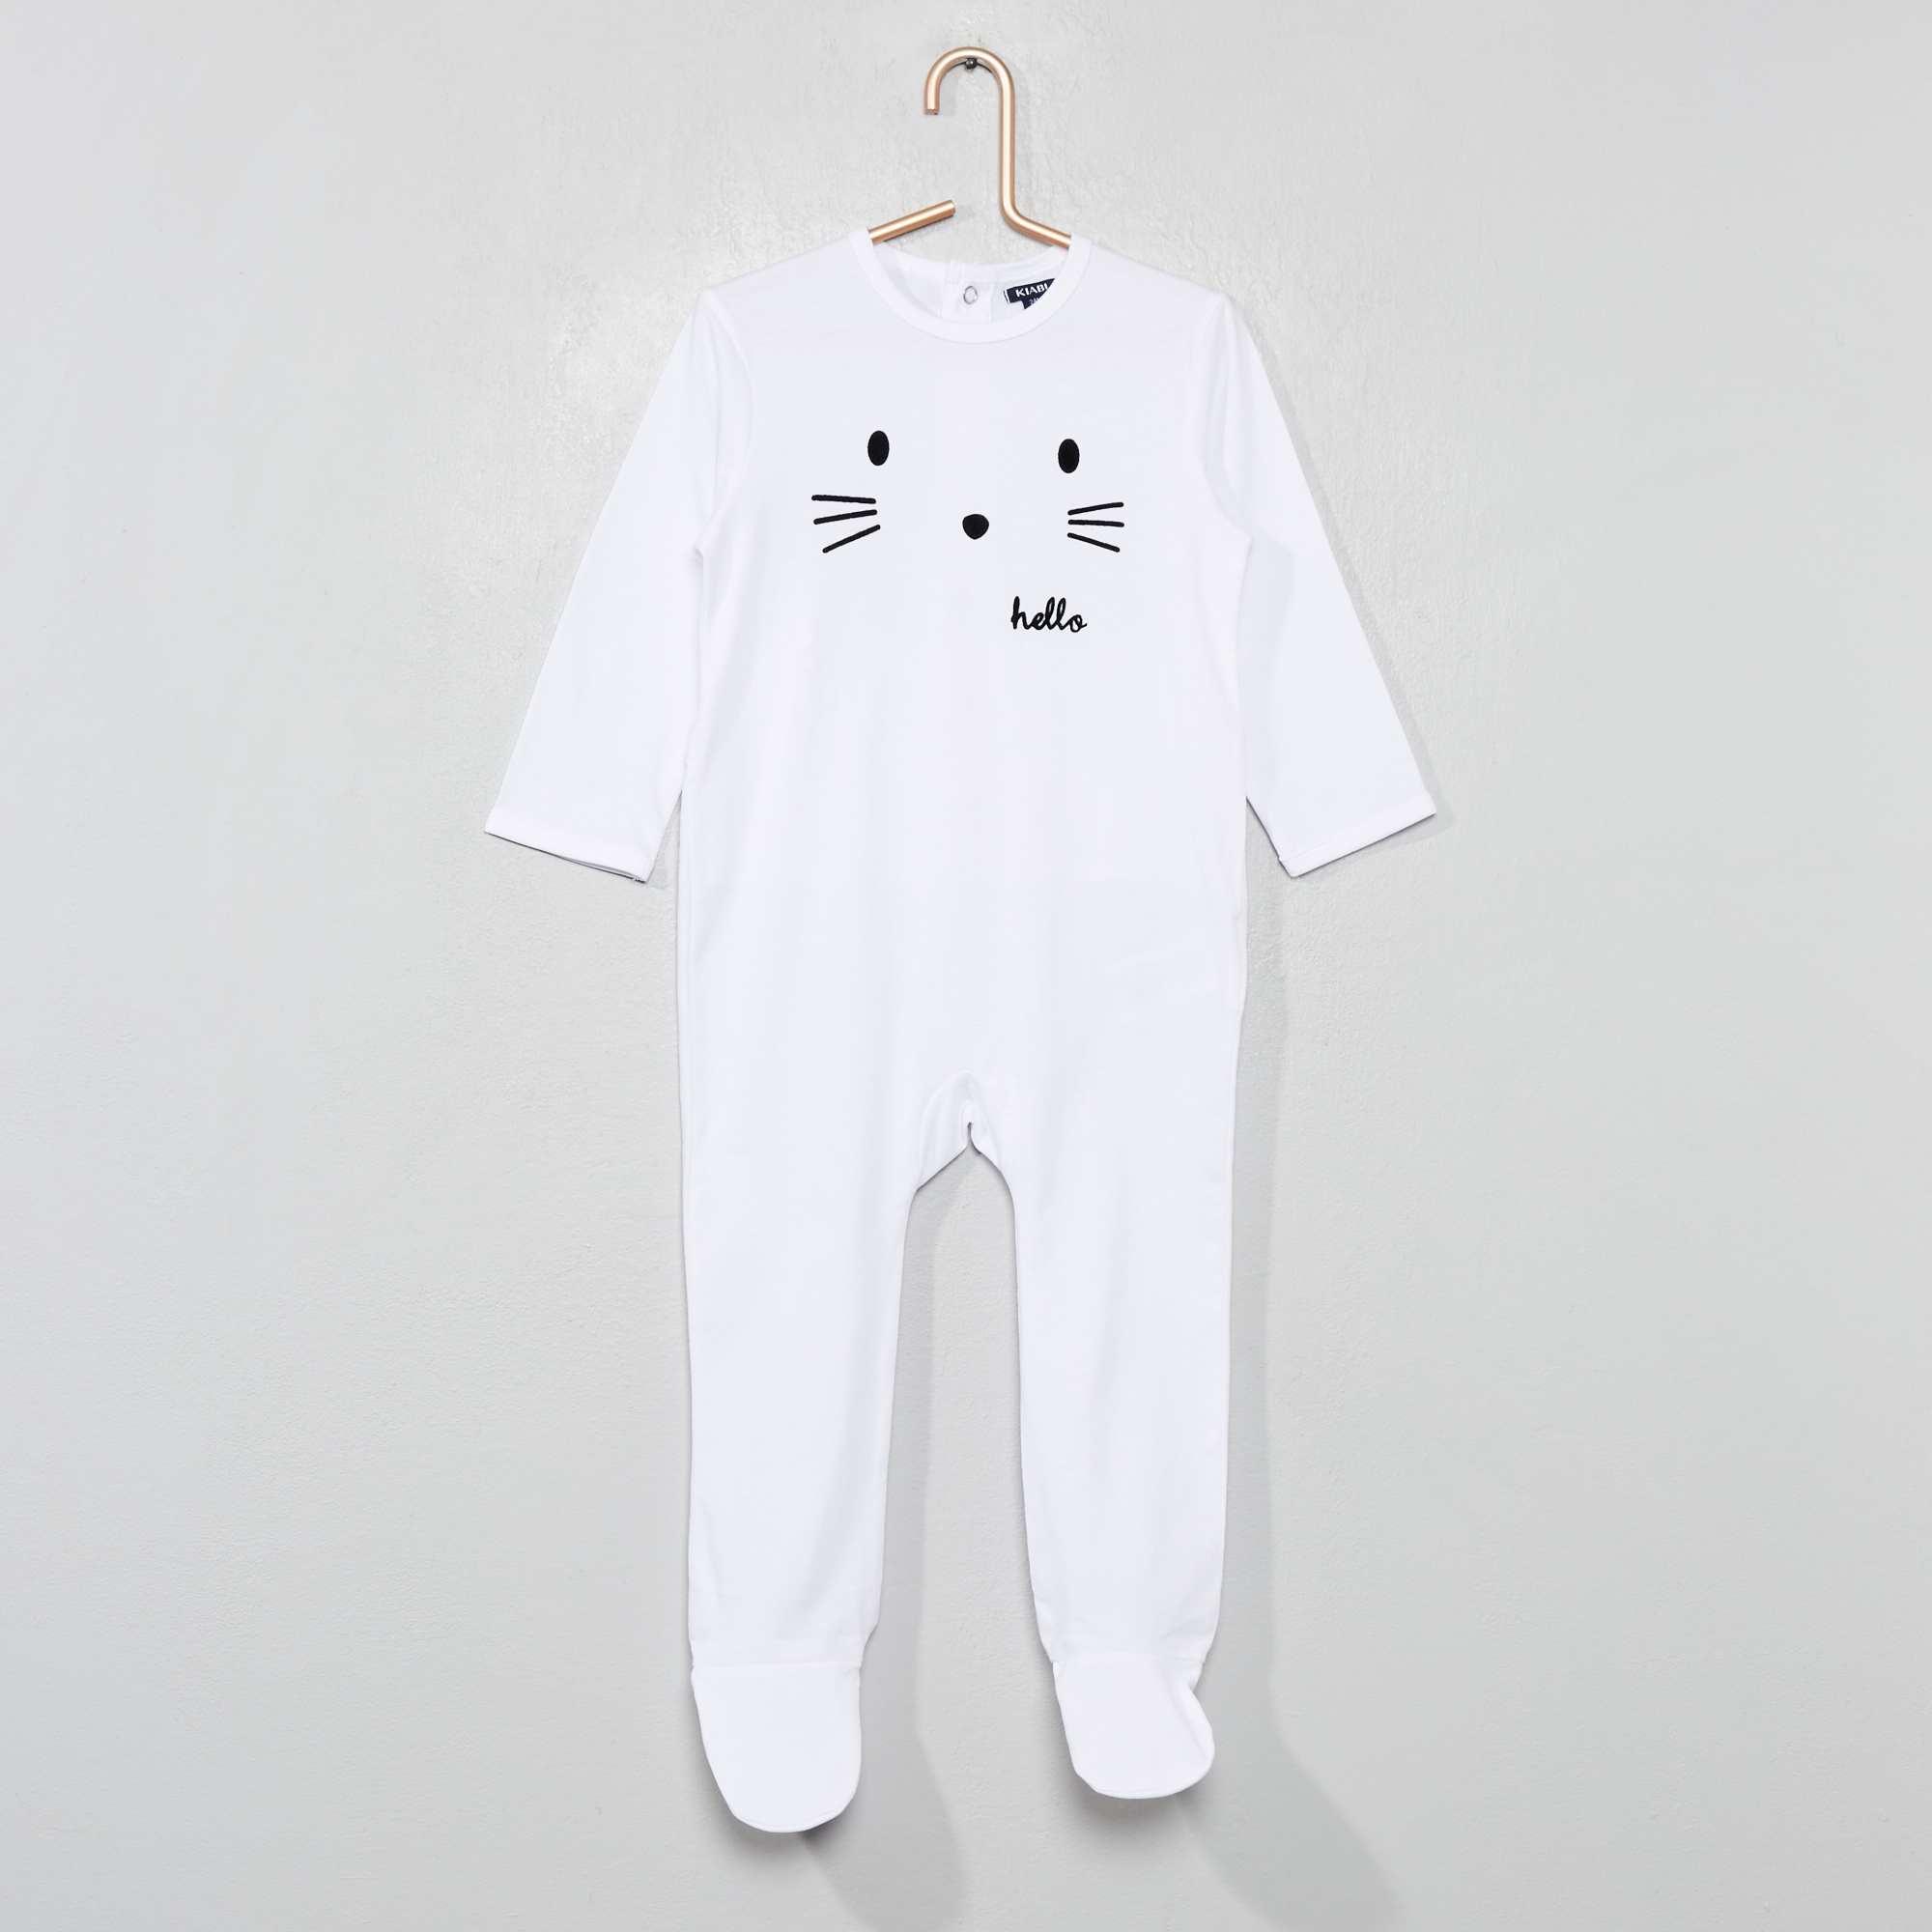 1cec6a0bf0d1e Pyjama jersey imprimé Bébé garçon - blanc hello - Kiabi - 9